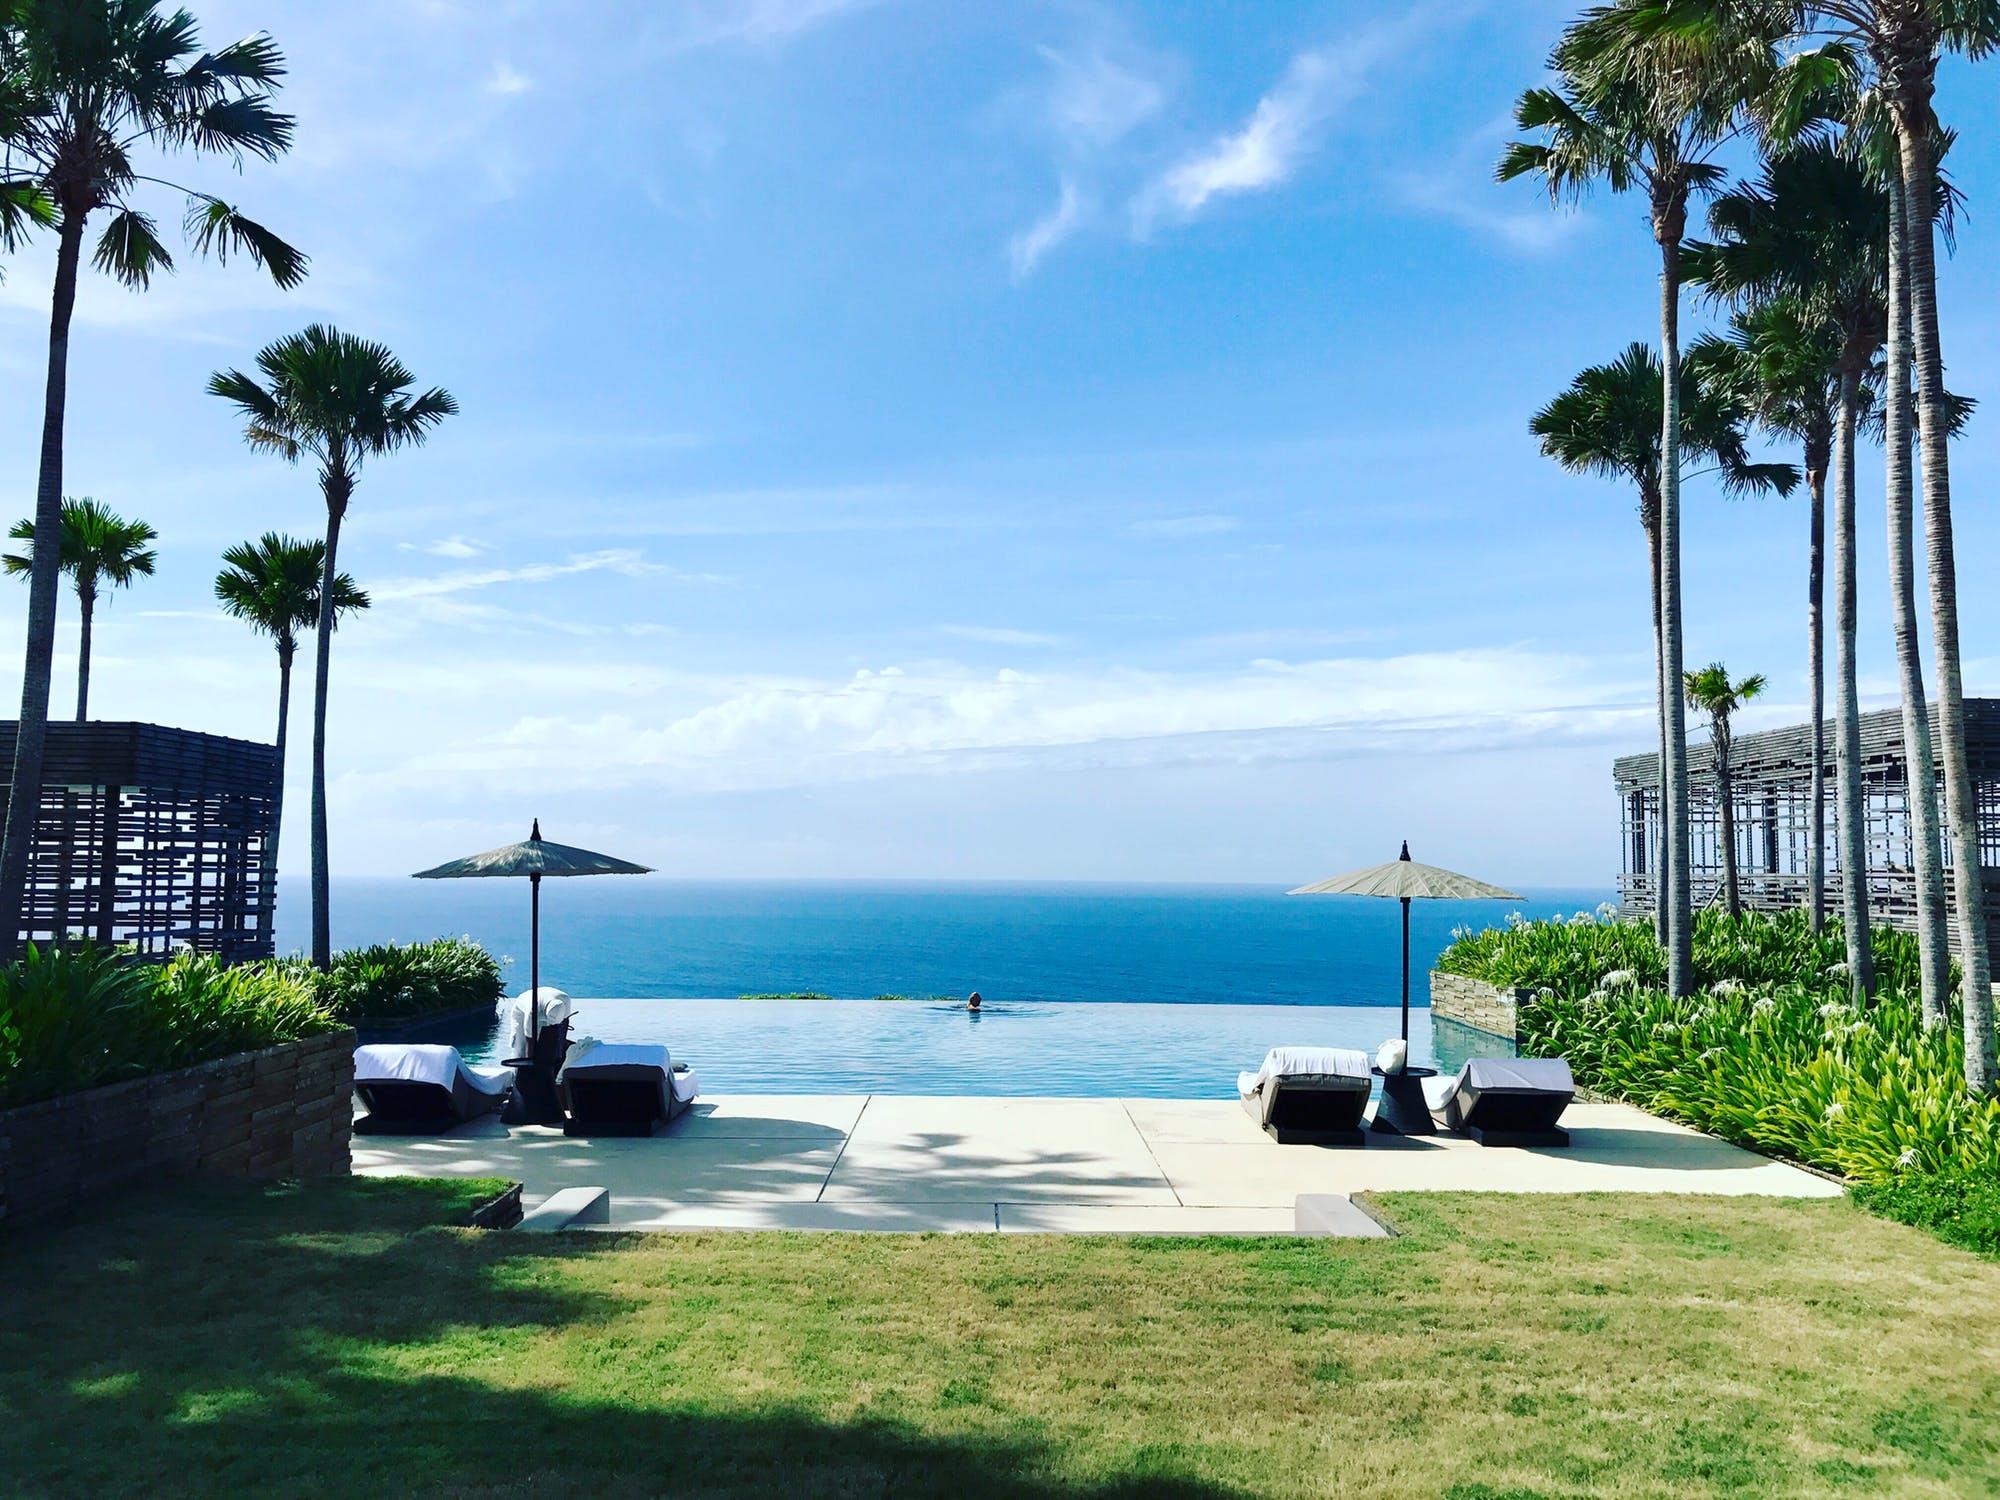 Luksusowe nieruchomości Costa del Sol